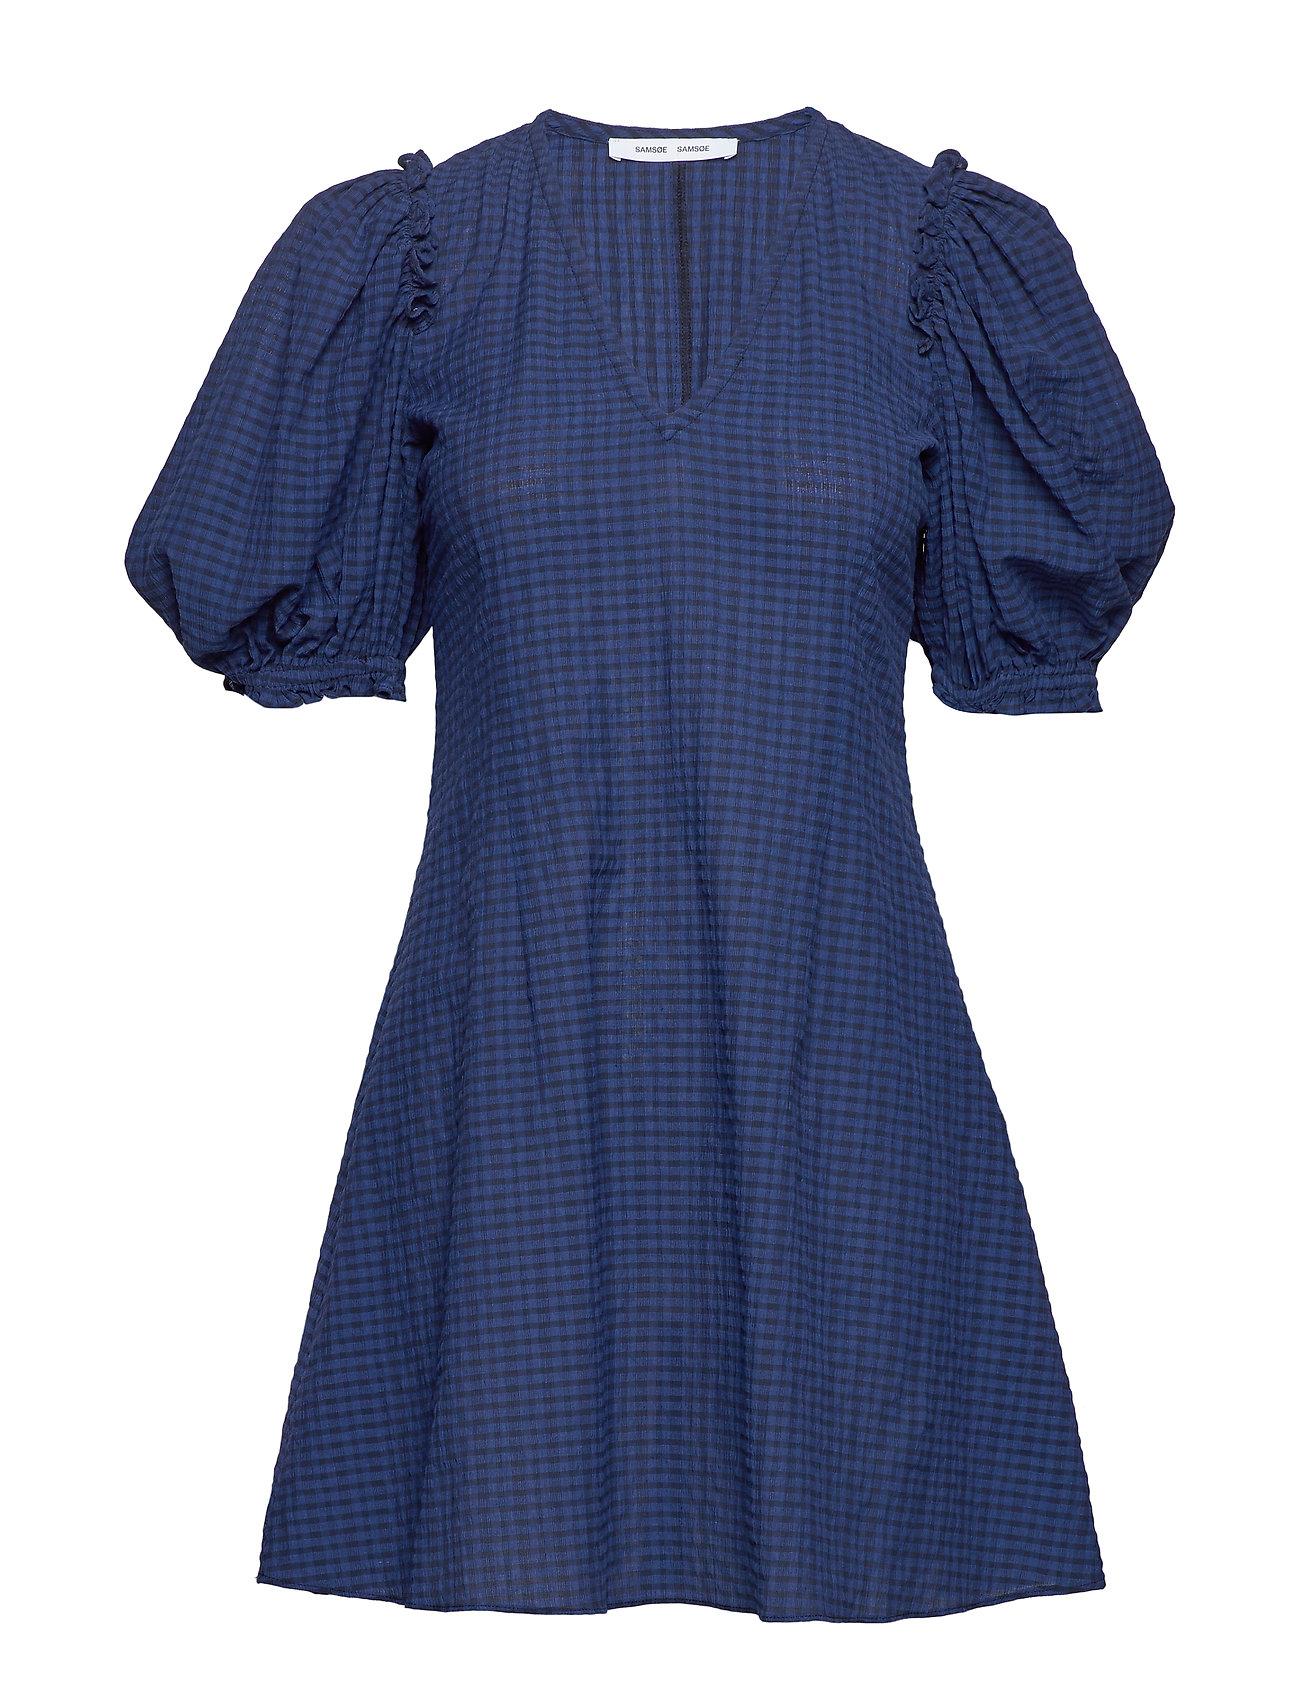 Samsøe & Samsøe Petulie dress 12732 - BLUE DEPTH CHECK